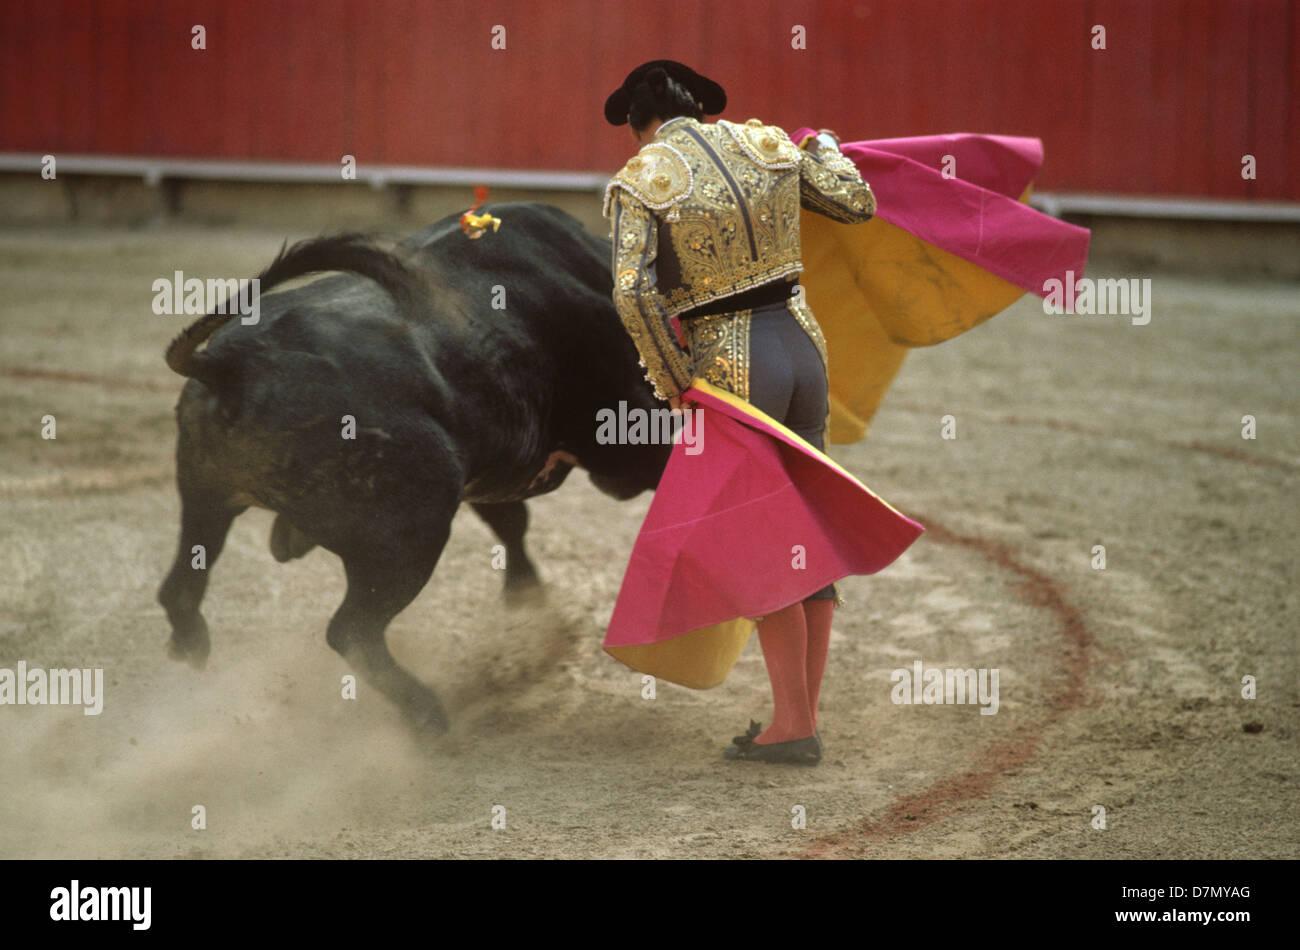 Bull fight, Cartagana, Colombia - Stock Image